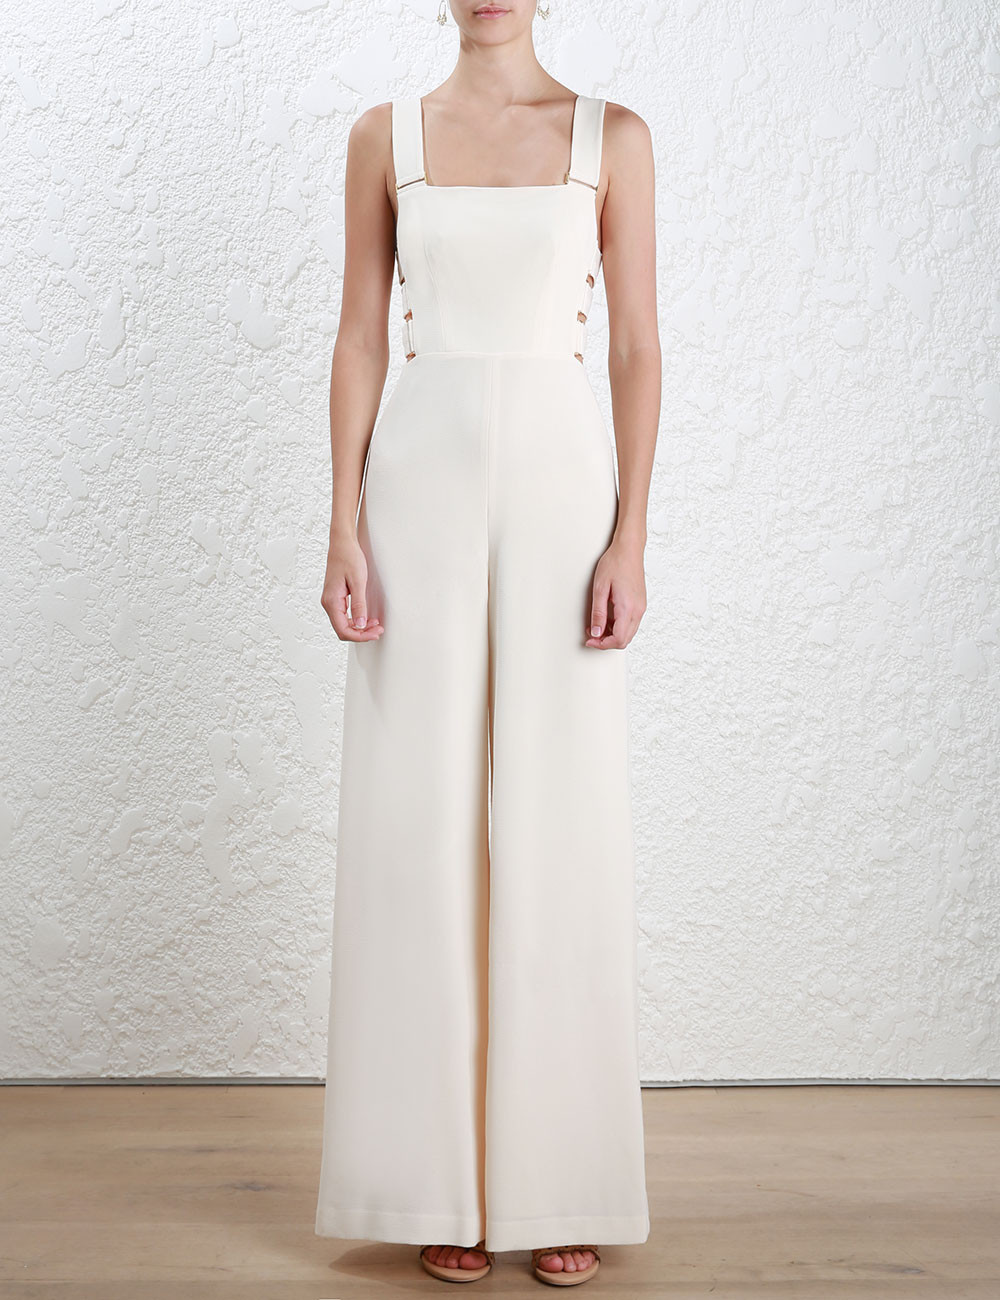 AEL Fashion Hollow Out Shoulder straps Jumpsuits Wide Leg Pants 2017 Summer Elegant Slim Backless Women